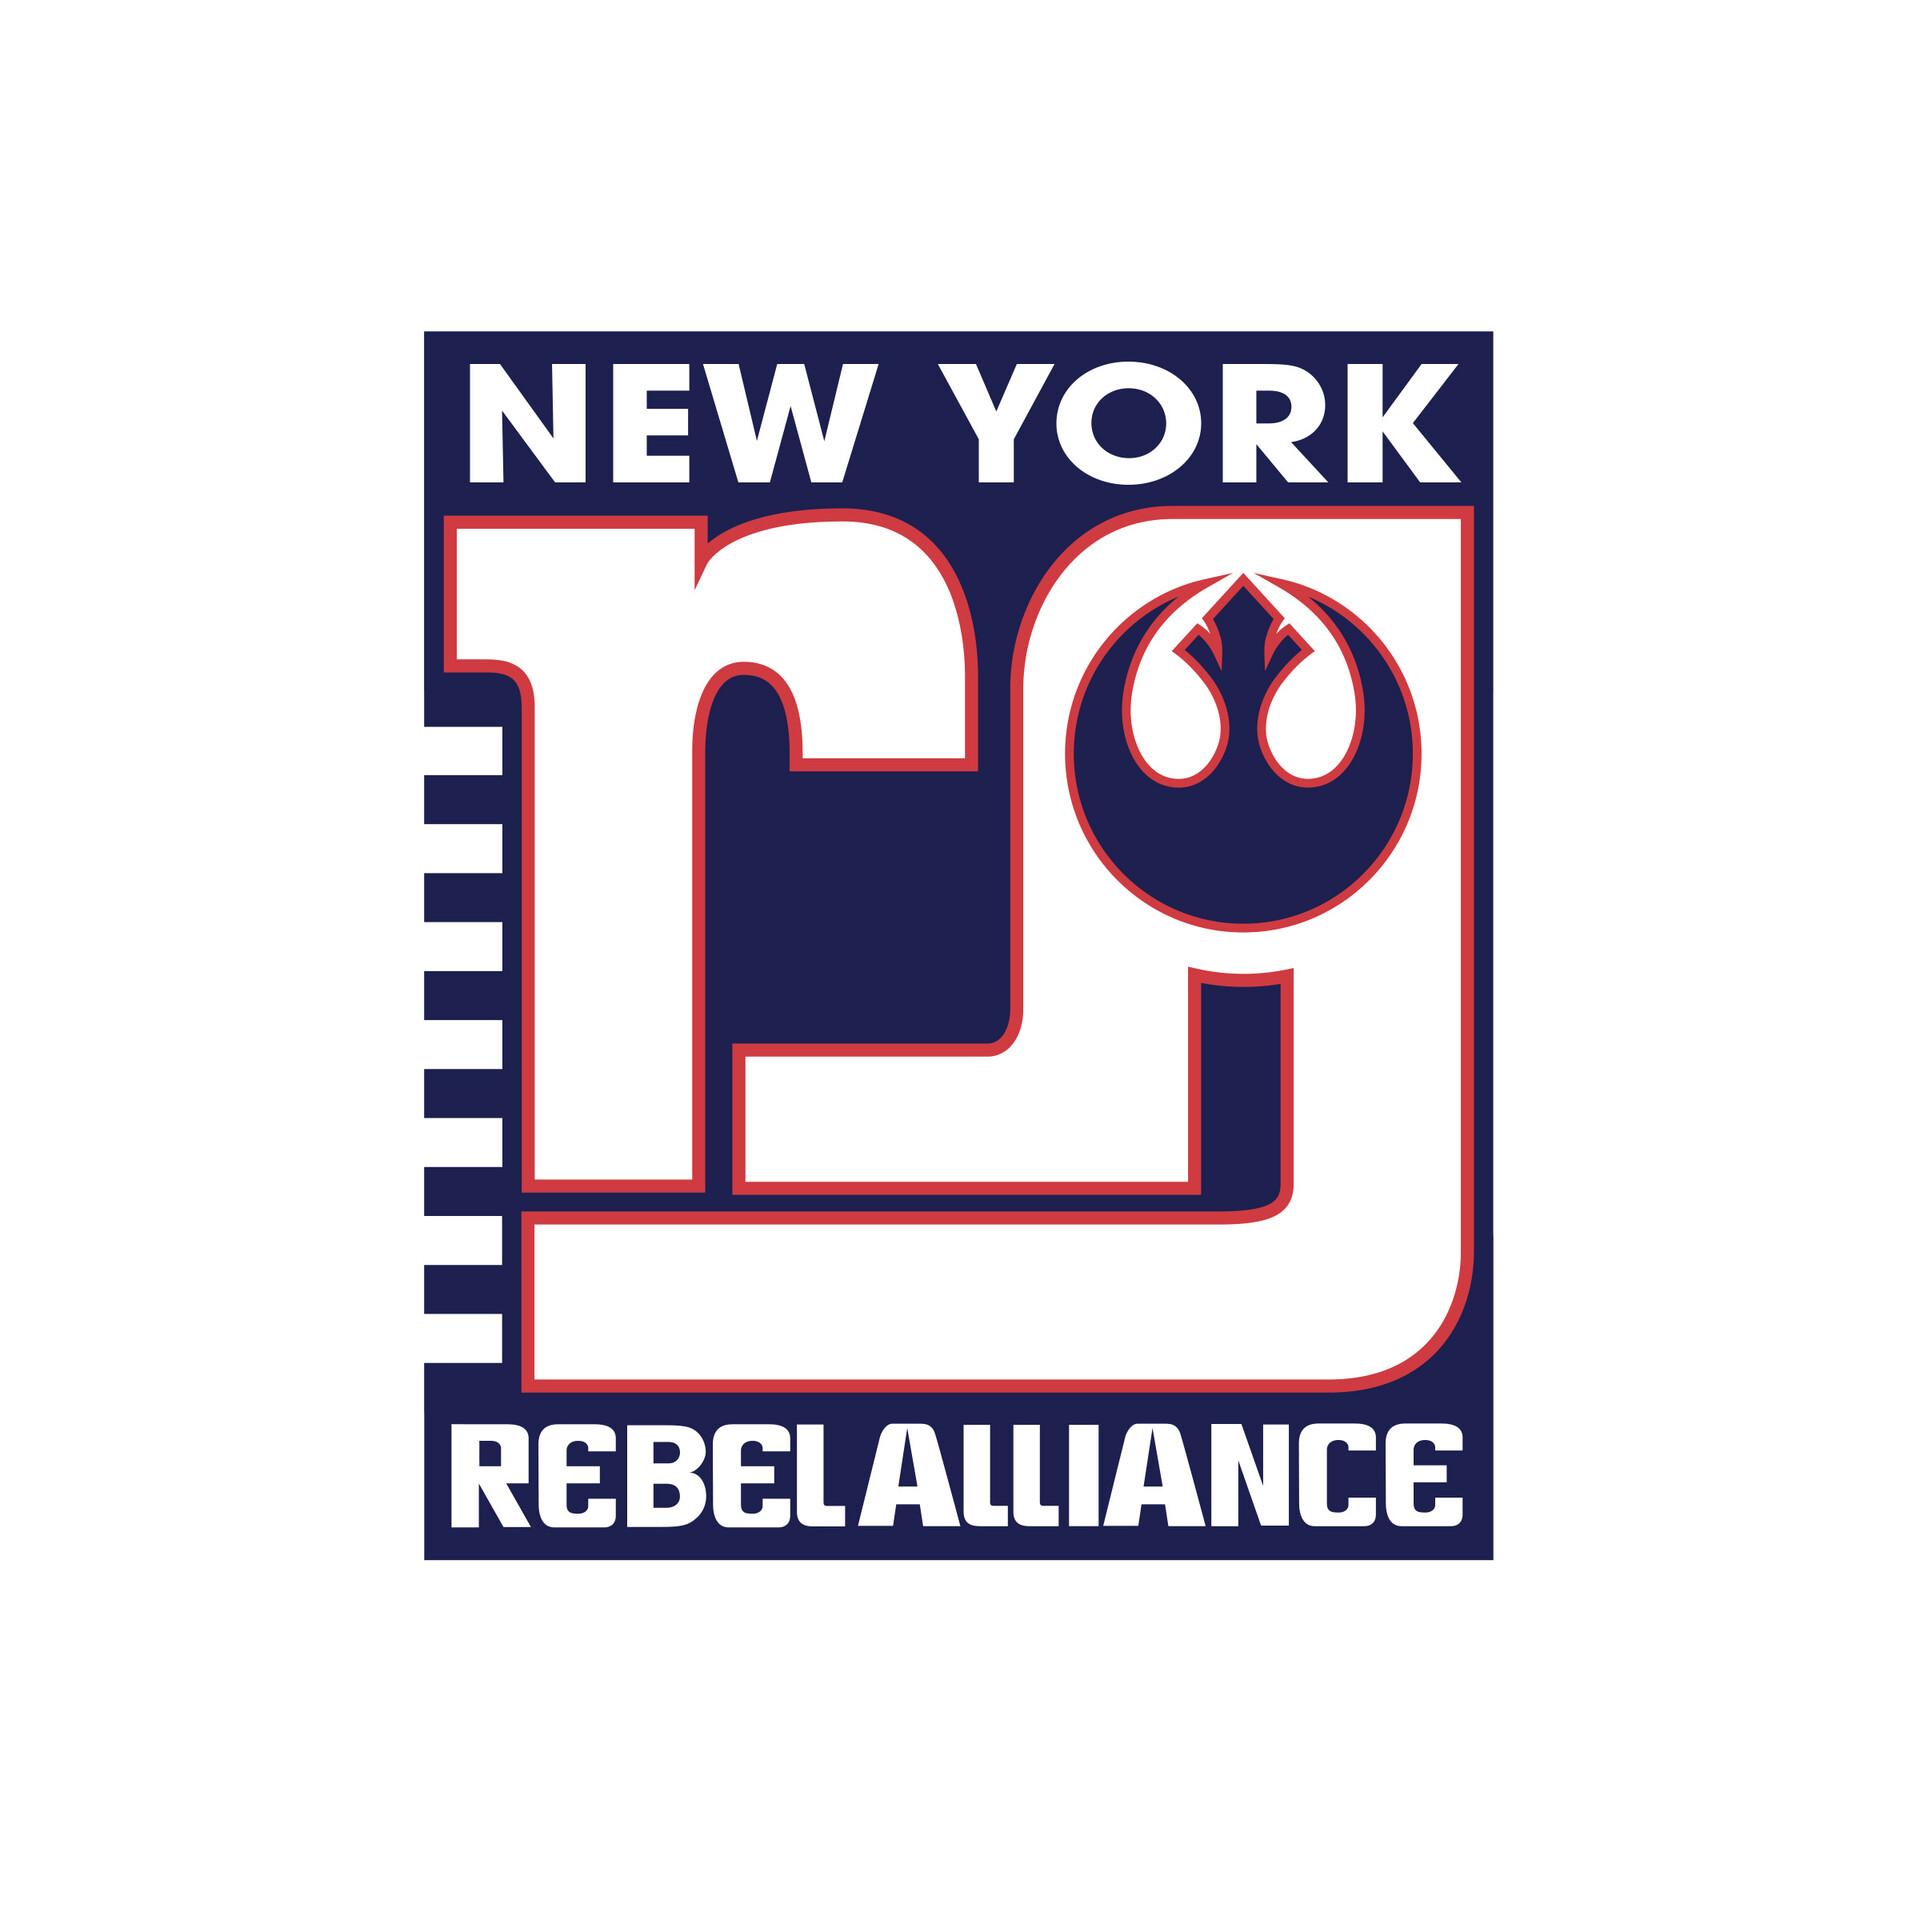 New York Rebel Alliance